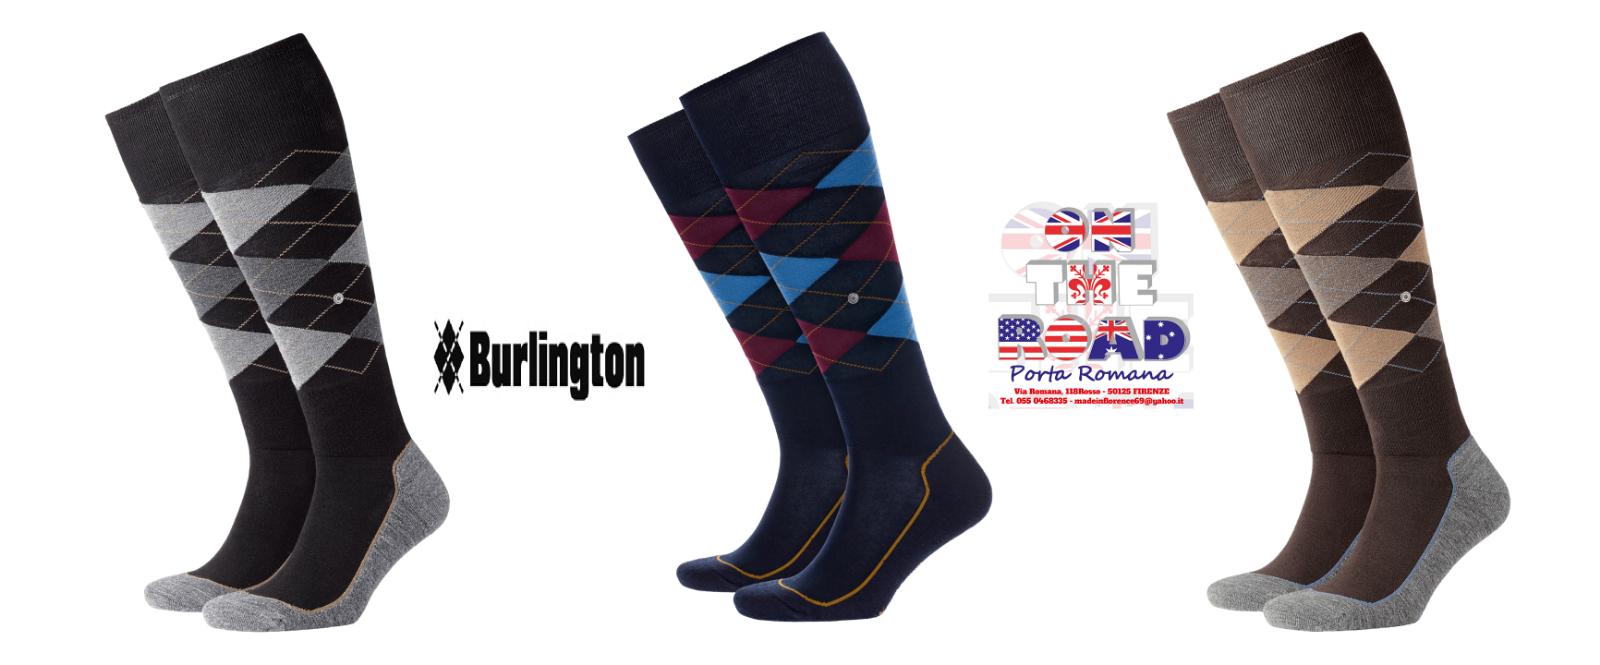 BURLINGTON SOCKS HACKNEY 21753 CALZINO LUNGO ROMBI 40/46 CALZE MISTO COTONE